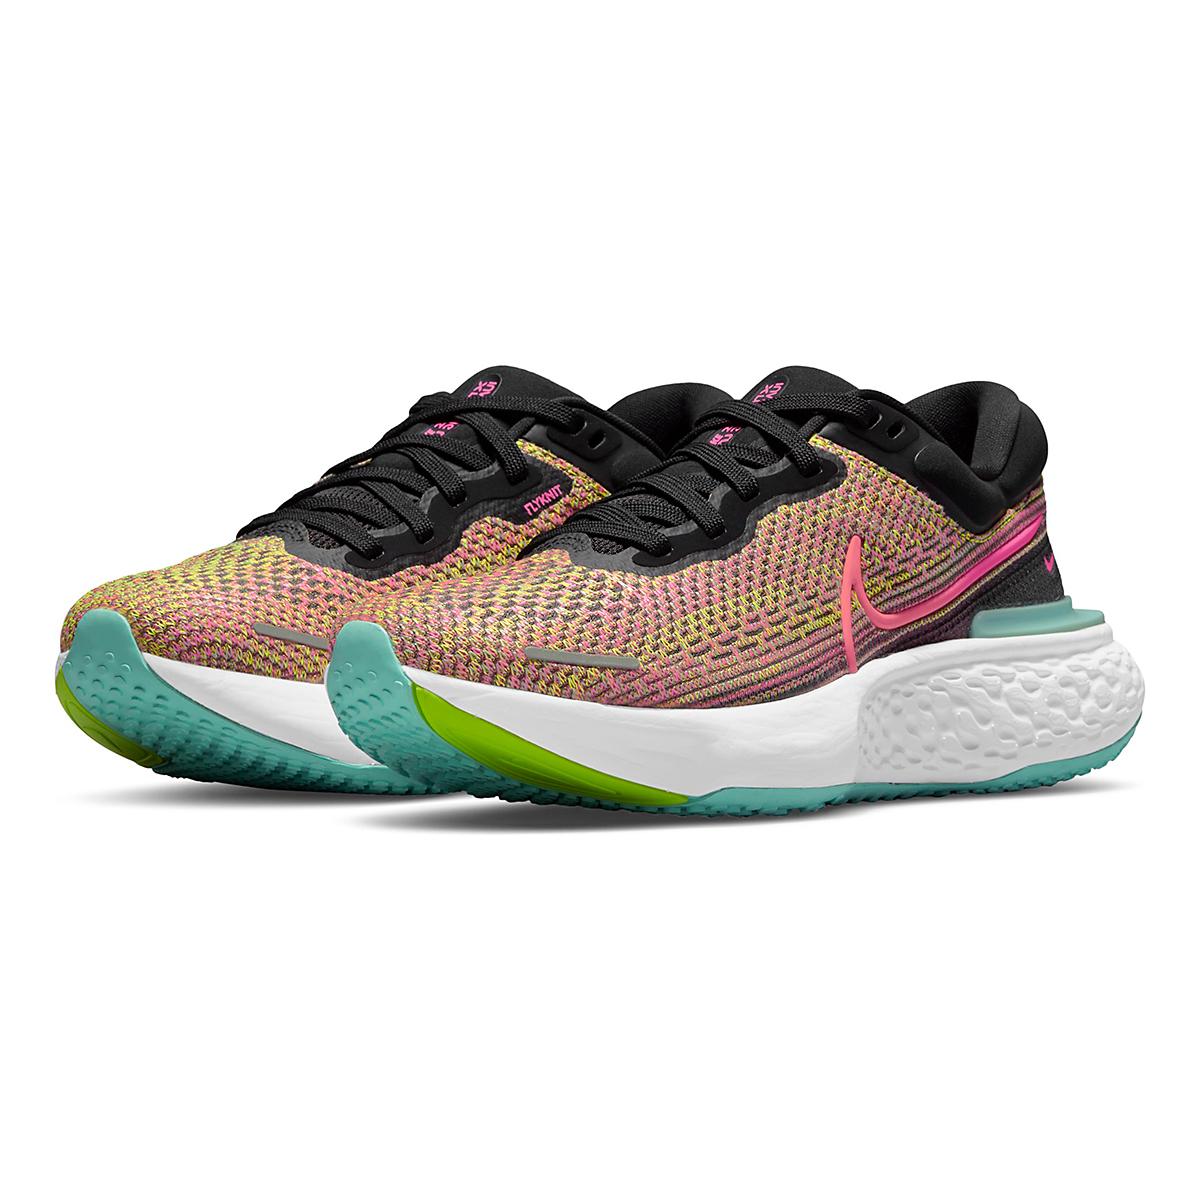 Women's Nike Zoomx Invincible Run FlyKnit Running Shoe - Color: Volt/Bright Mango/Black/Light Dew - Size: 5 - Width: Regular, Volt/Bright Mango/Black/Light Dew, large, image 3